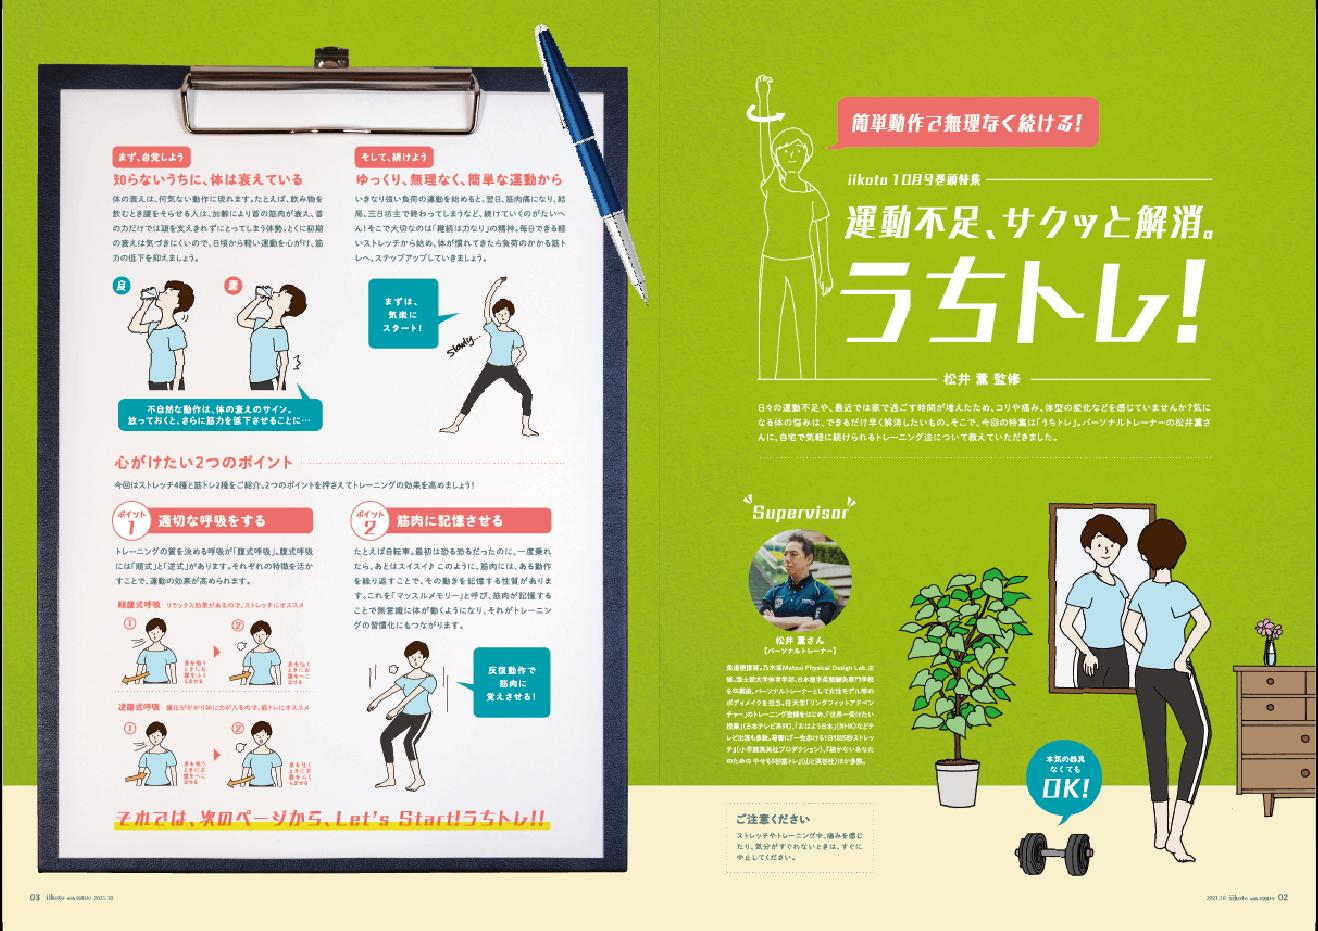 iikoto最新号の巻頭特集